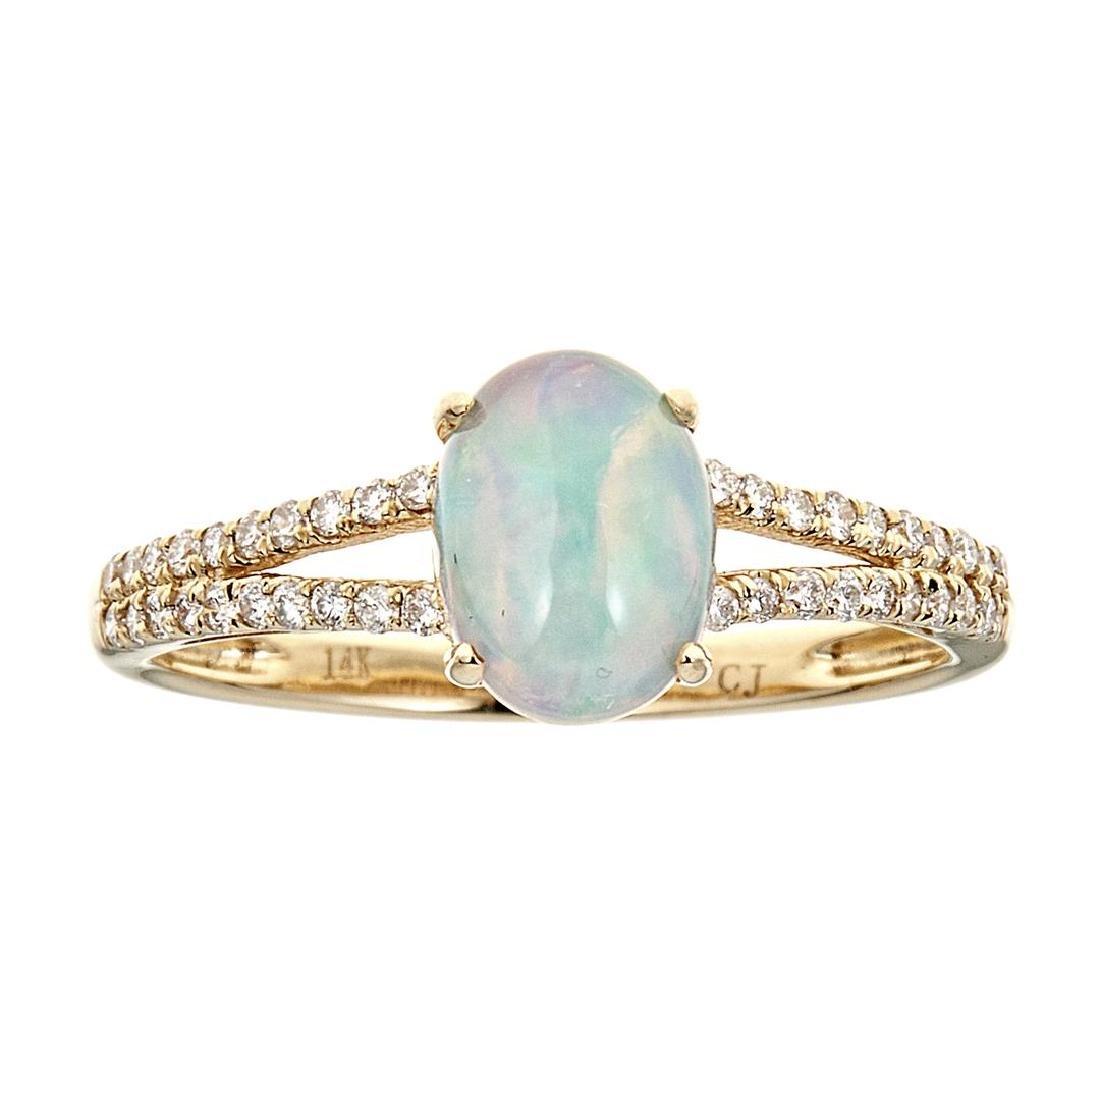 0.9 ctw Ethiopian Opal and Diamond Ring - 14KT Yellow